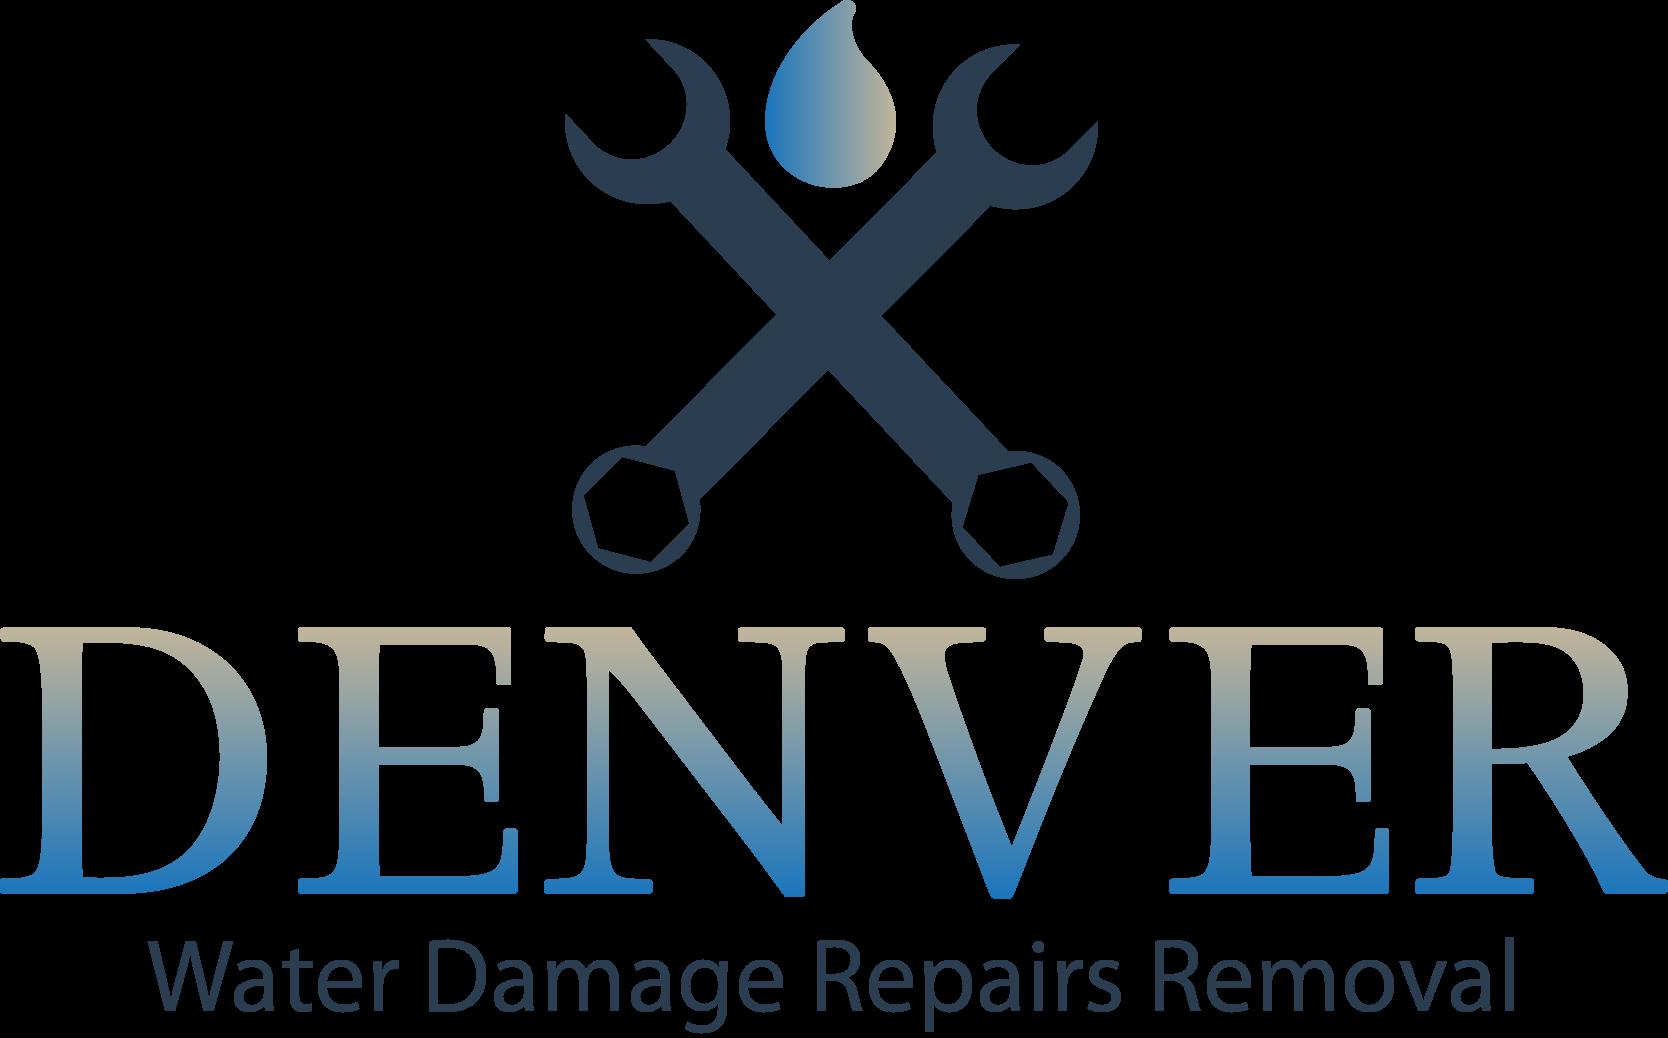 3 ways to clean up water damage in Denver helps residential & commercial customers navigate emergencies